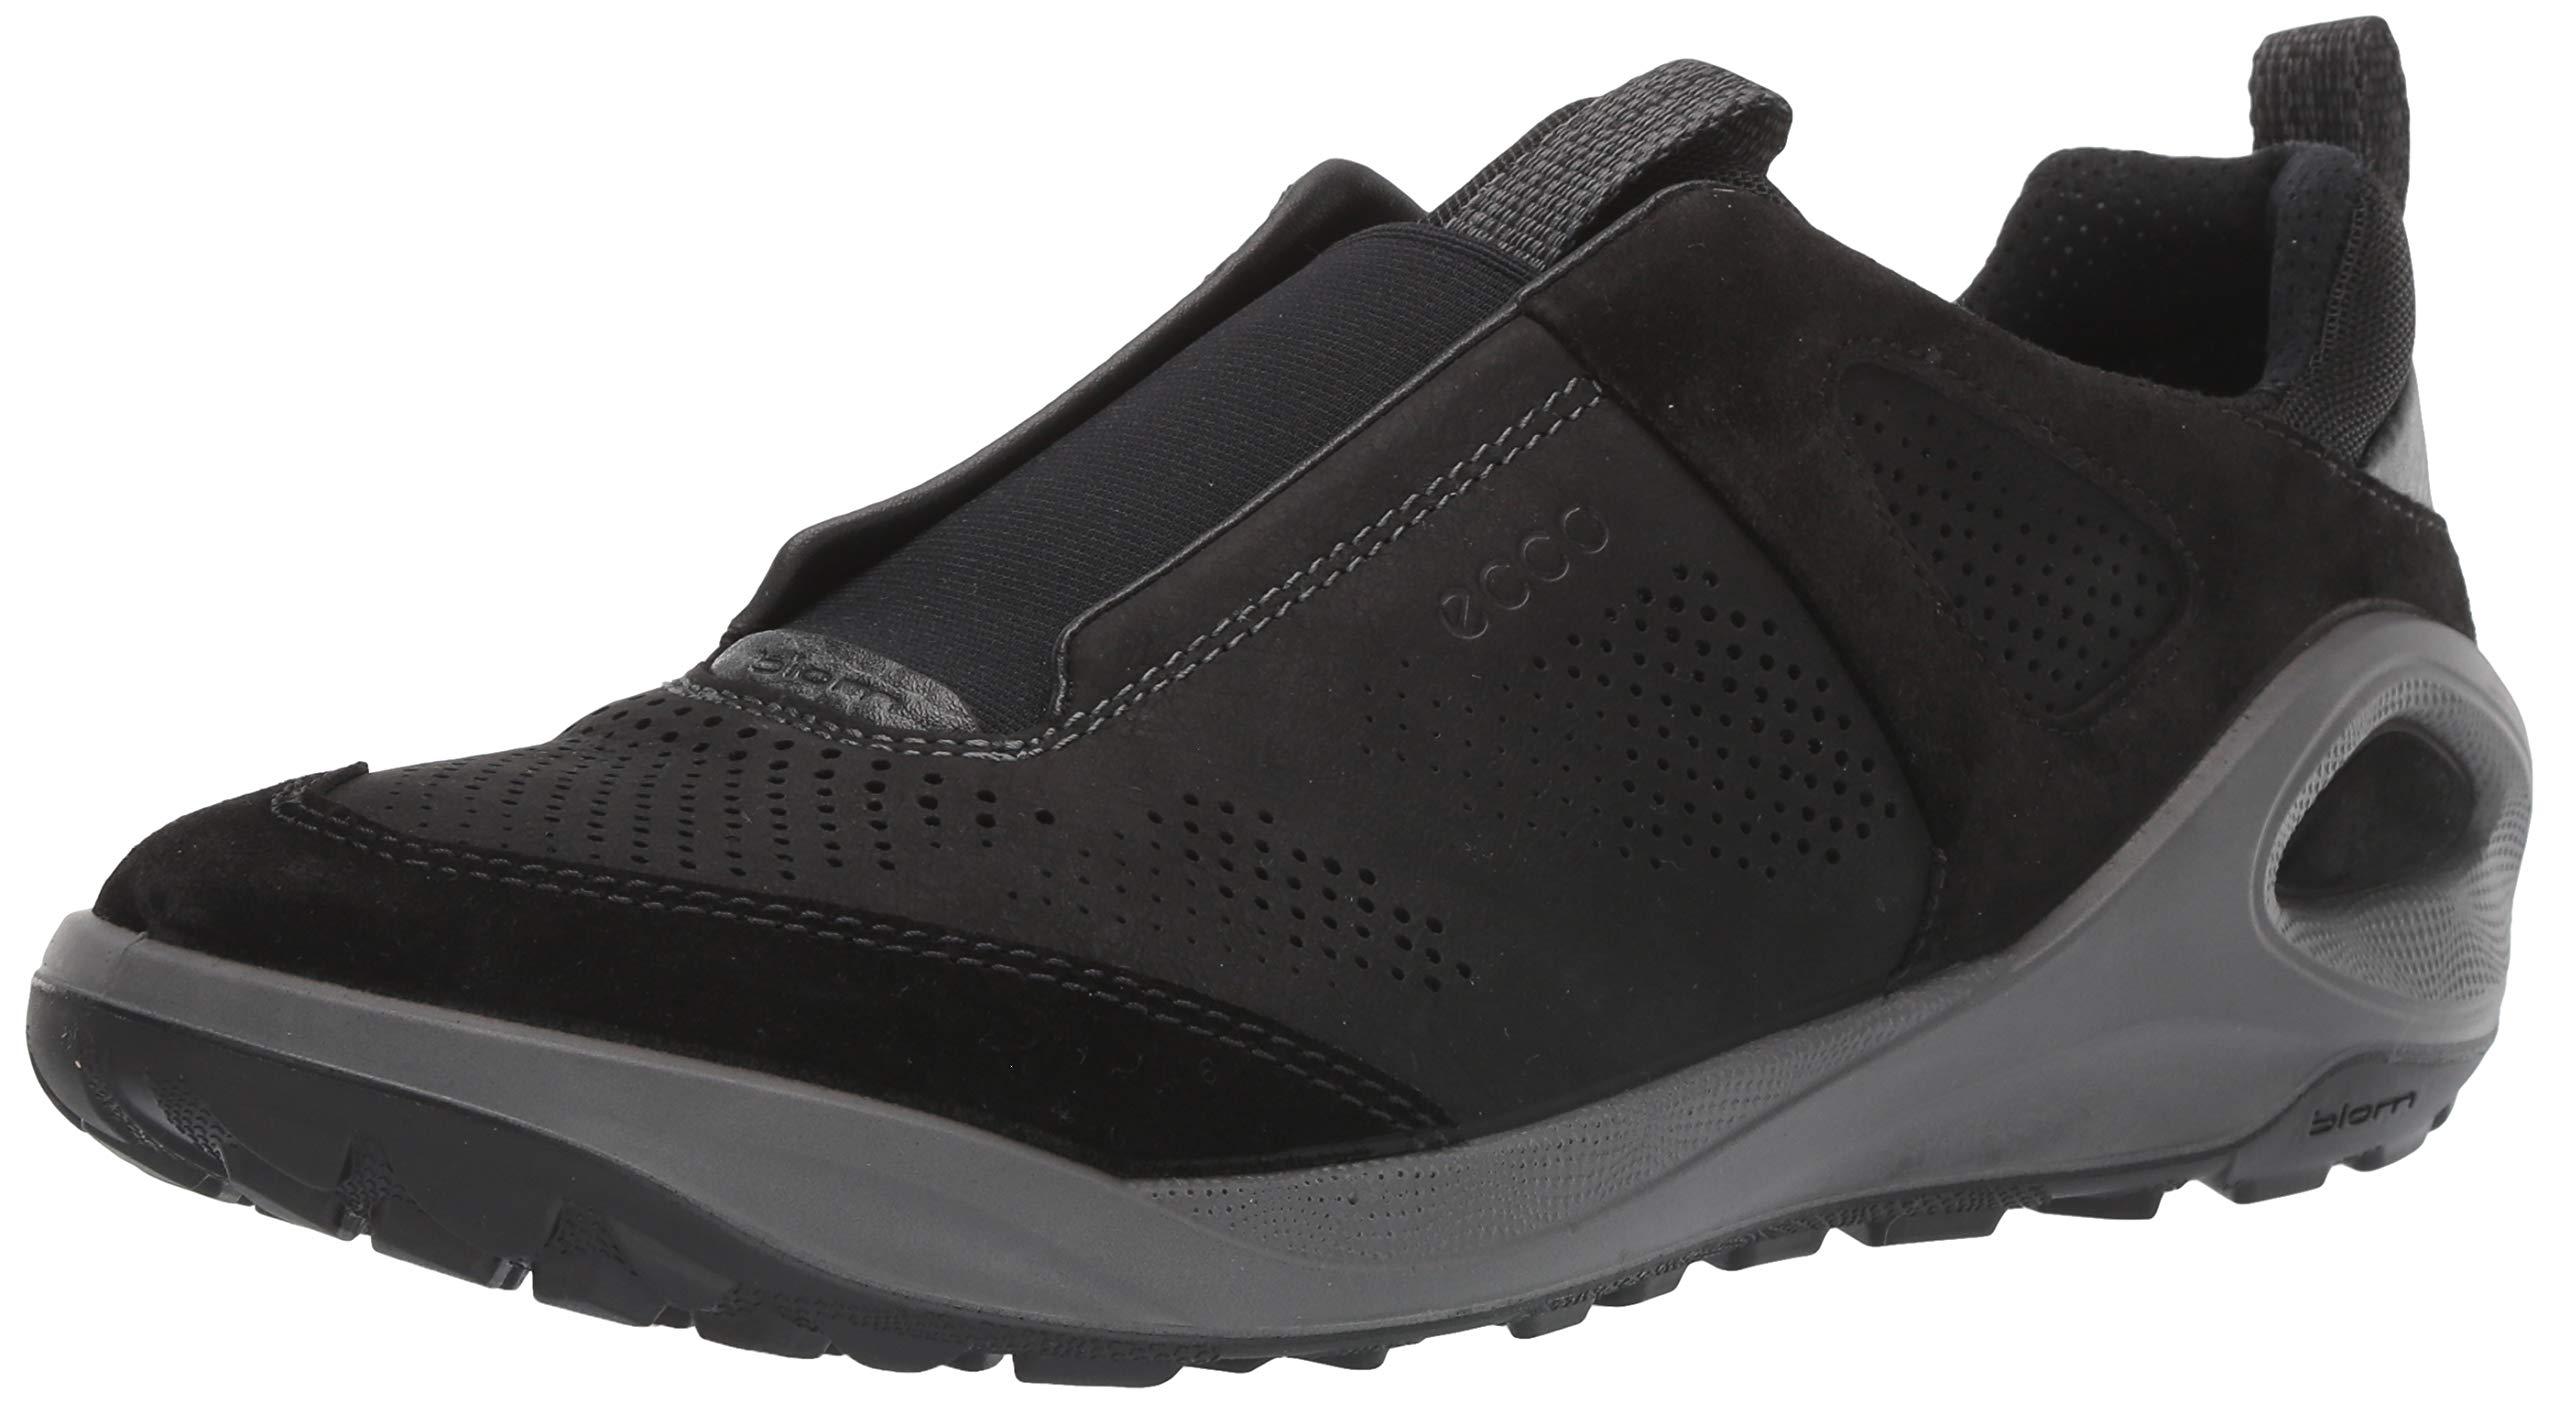 ECCO BIOM 2GOメンズアウトドアライフスタイル、スポーツの様々な、水、フットペダル靴